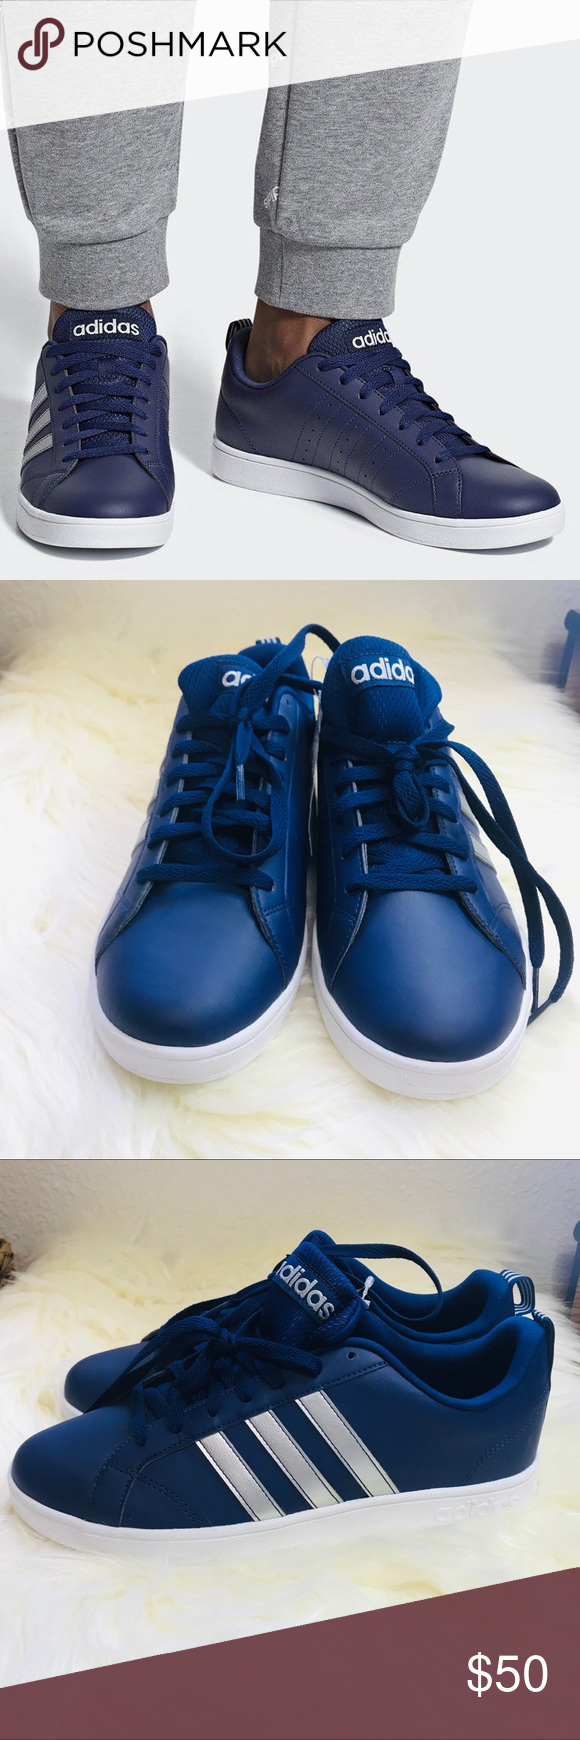 Adidas Men's Neo Vs Advantage Tennis Shoes ADIDAS NEO VS ADVANTAGE ...